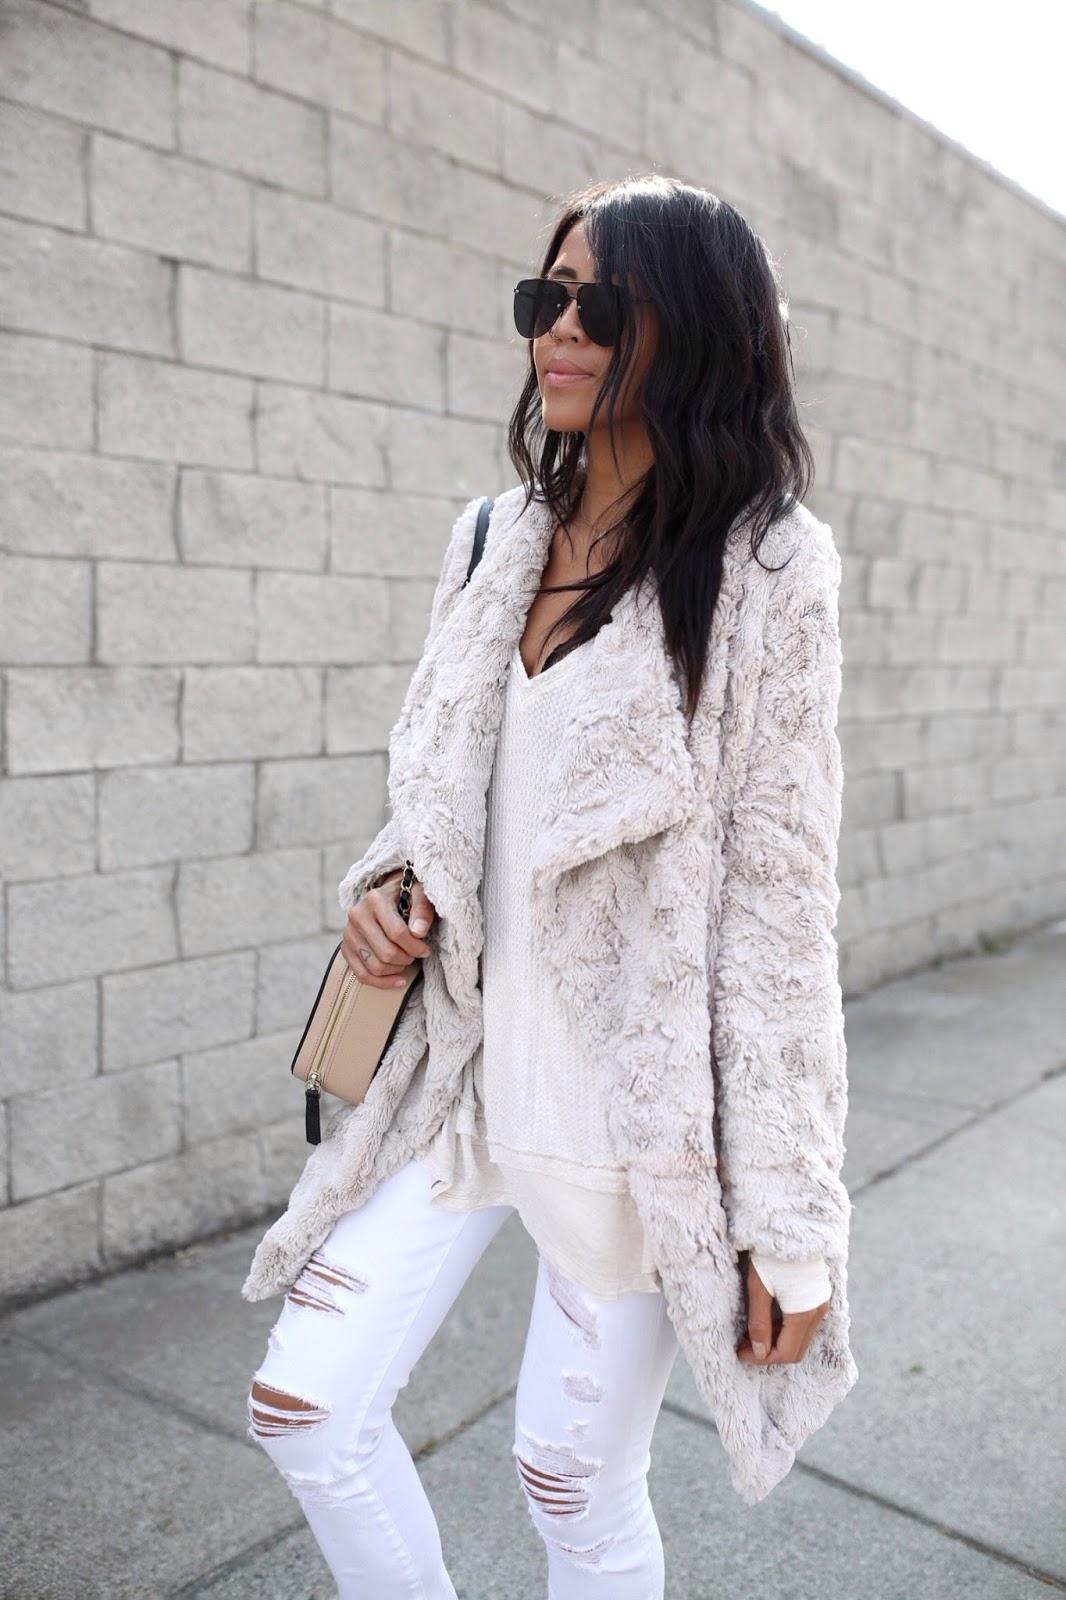 Free People Thermal Top BB Dakota Faux Fur Coat Gypsy Tan